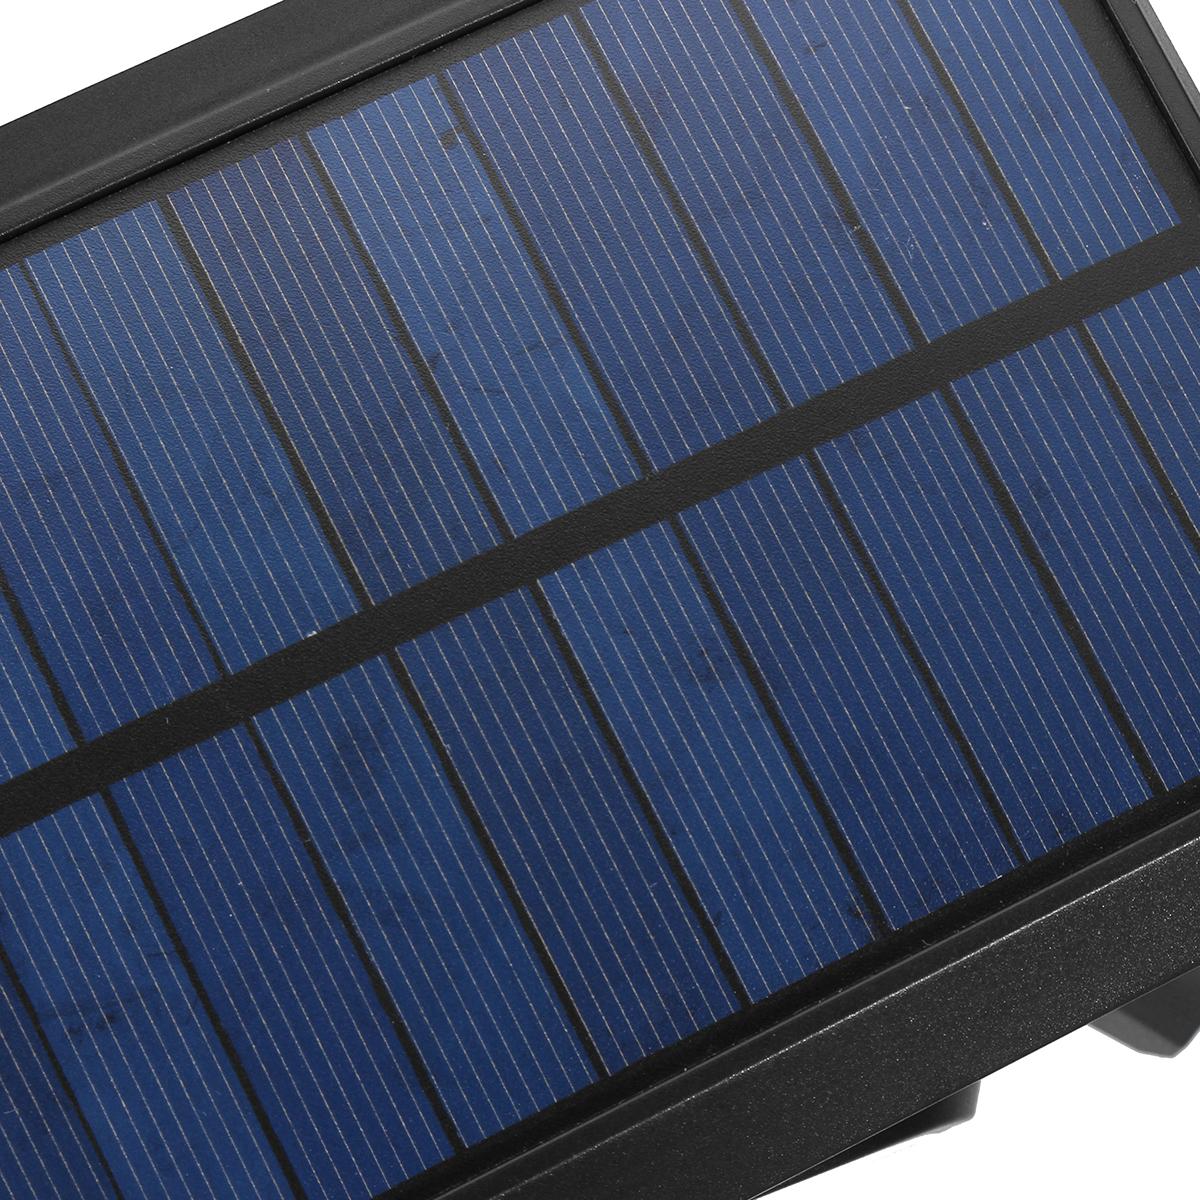 140 COB Solar Wall Light Three-Head Induction Motion Sensor Street Light Garden Courtyard Pathway Lawn